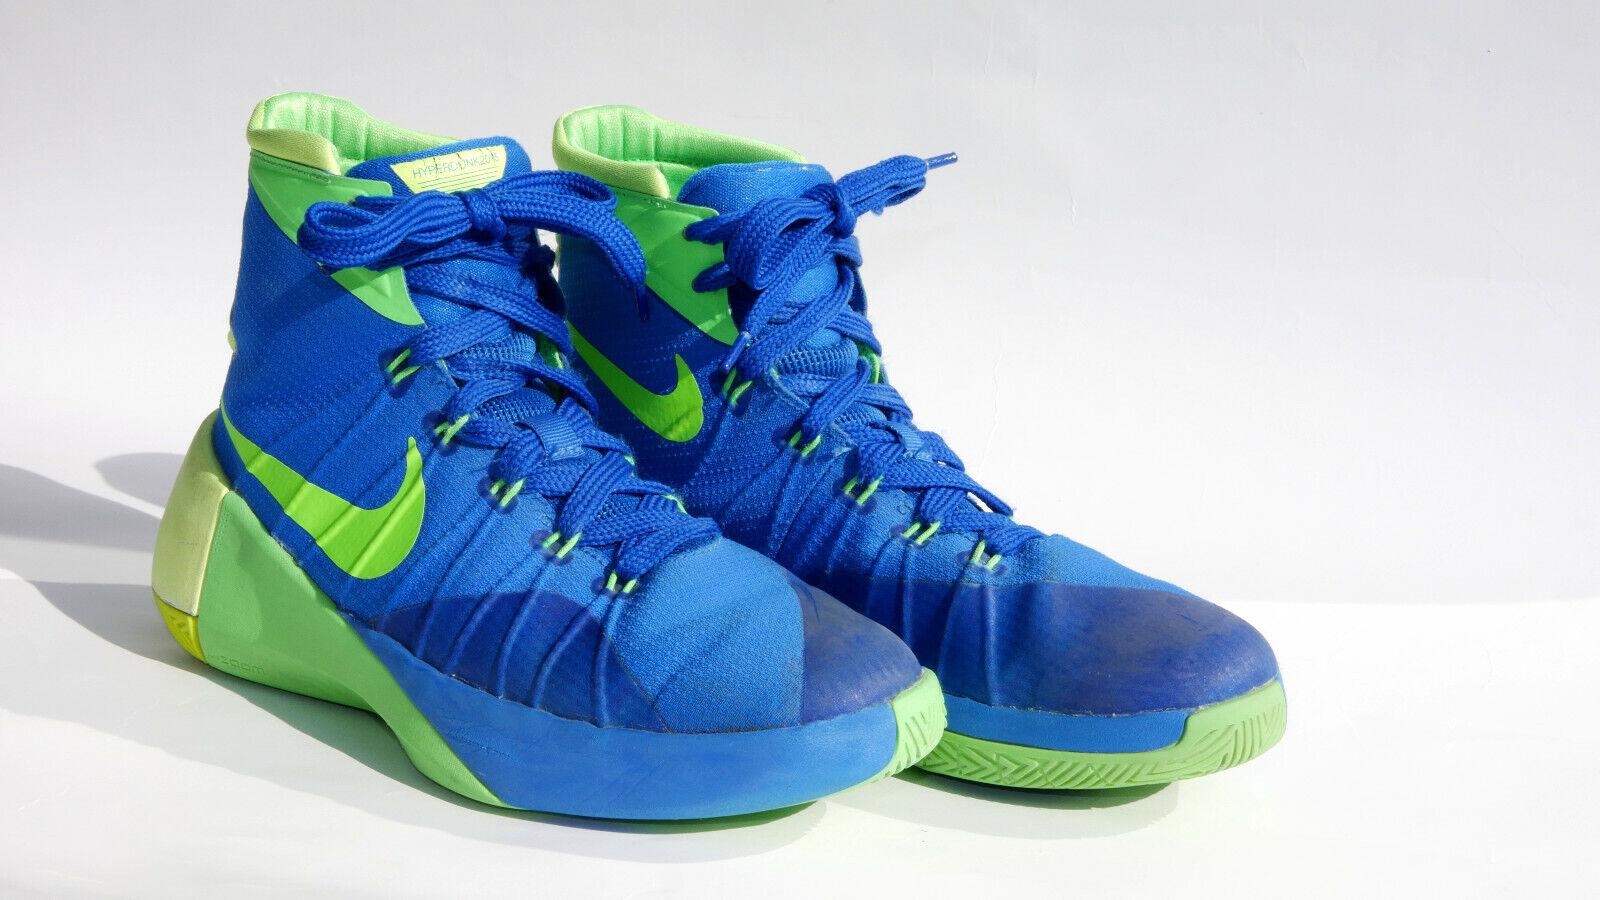 Basketballschuhe 37 Nike Test Vergleich +++ Basketballschuhe